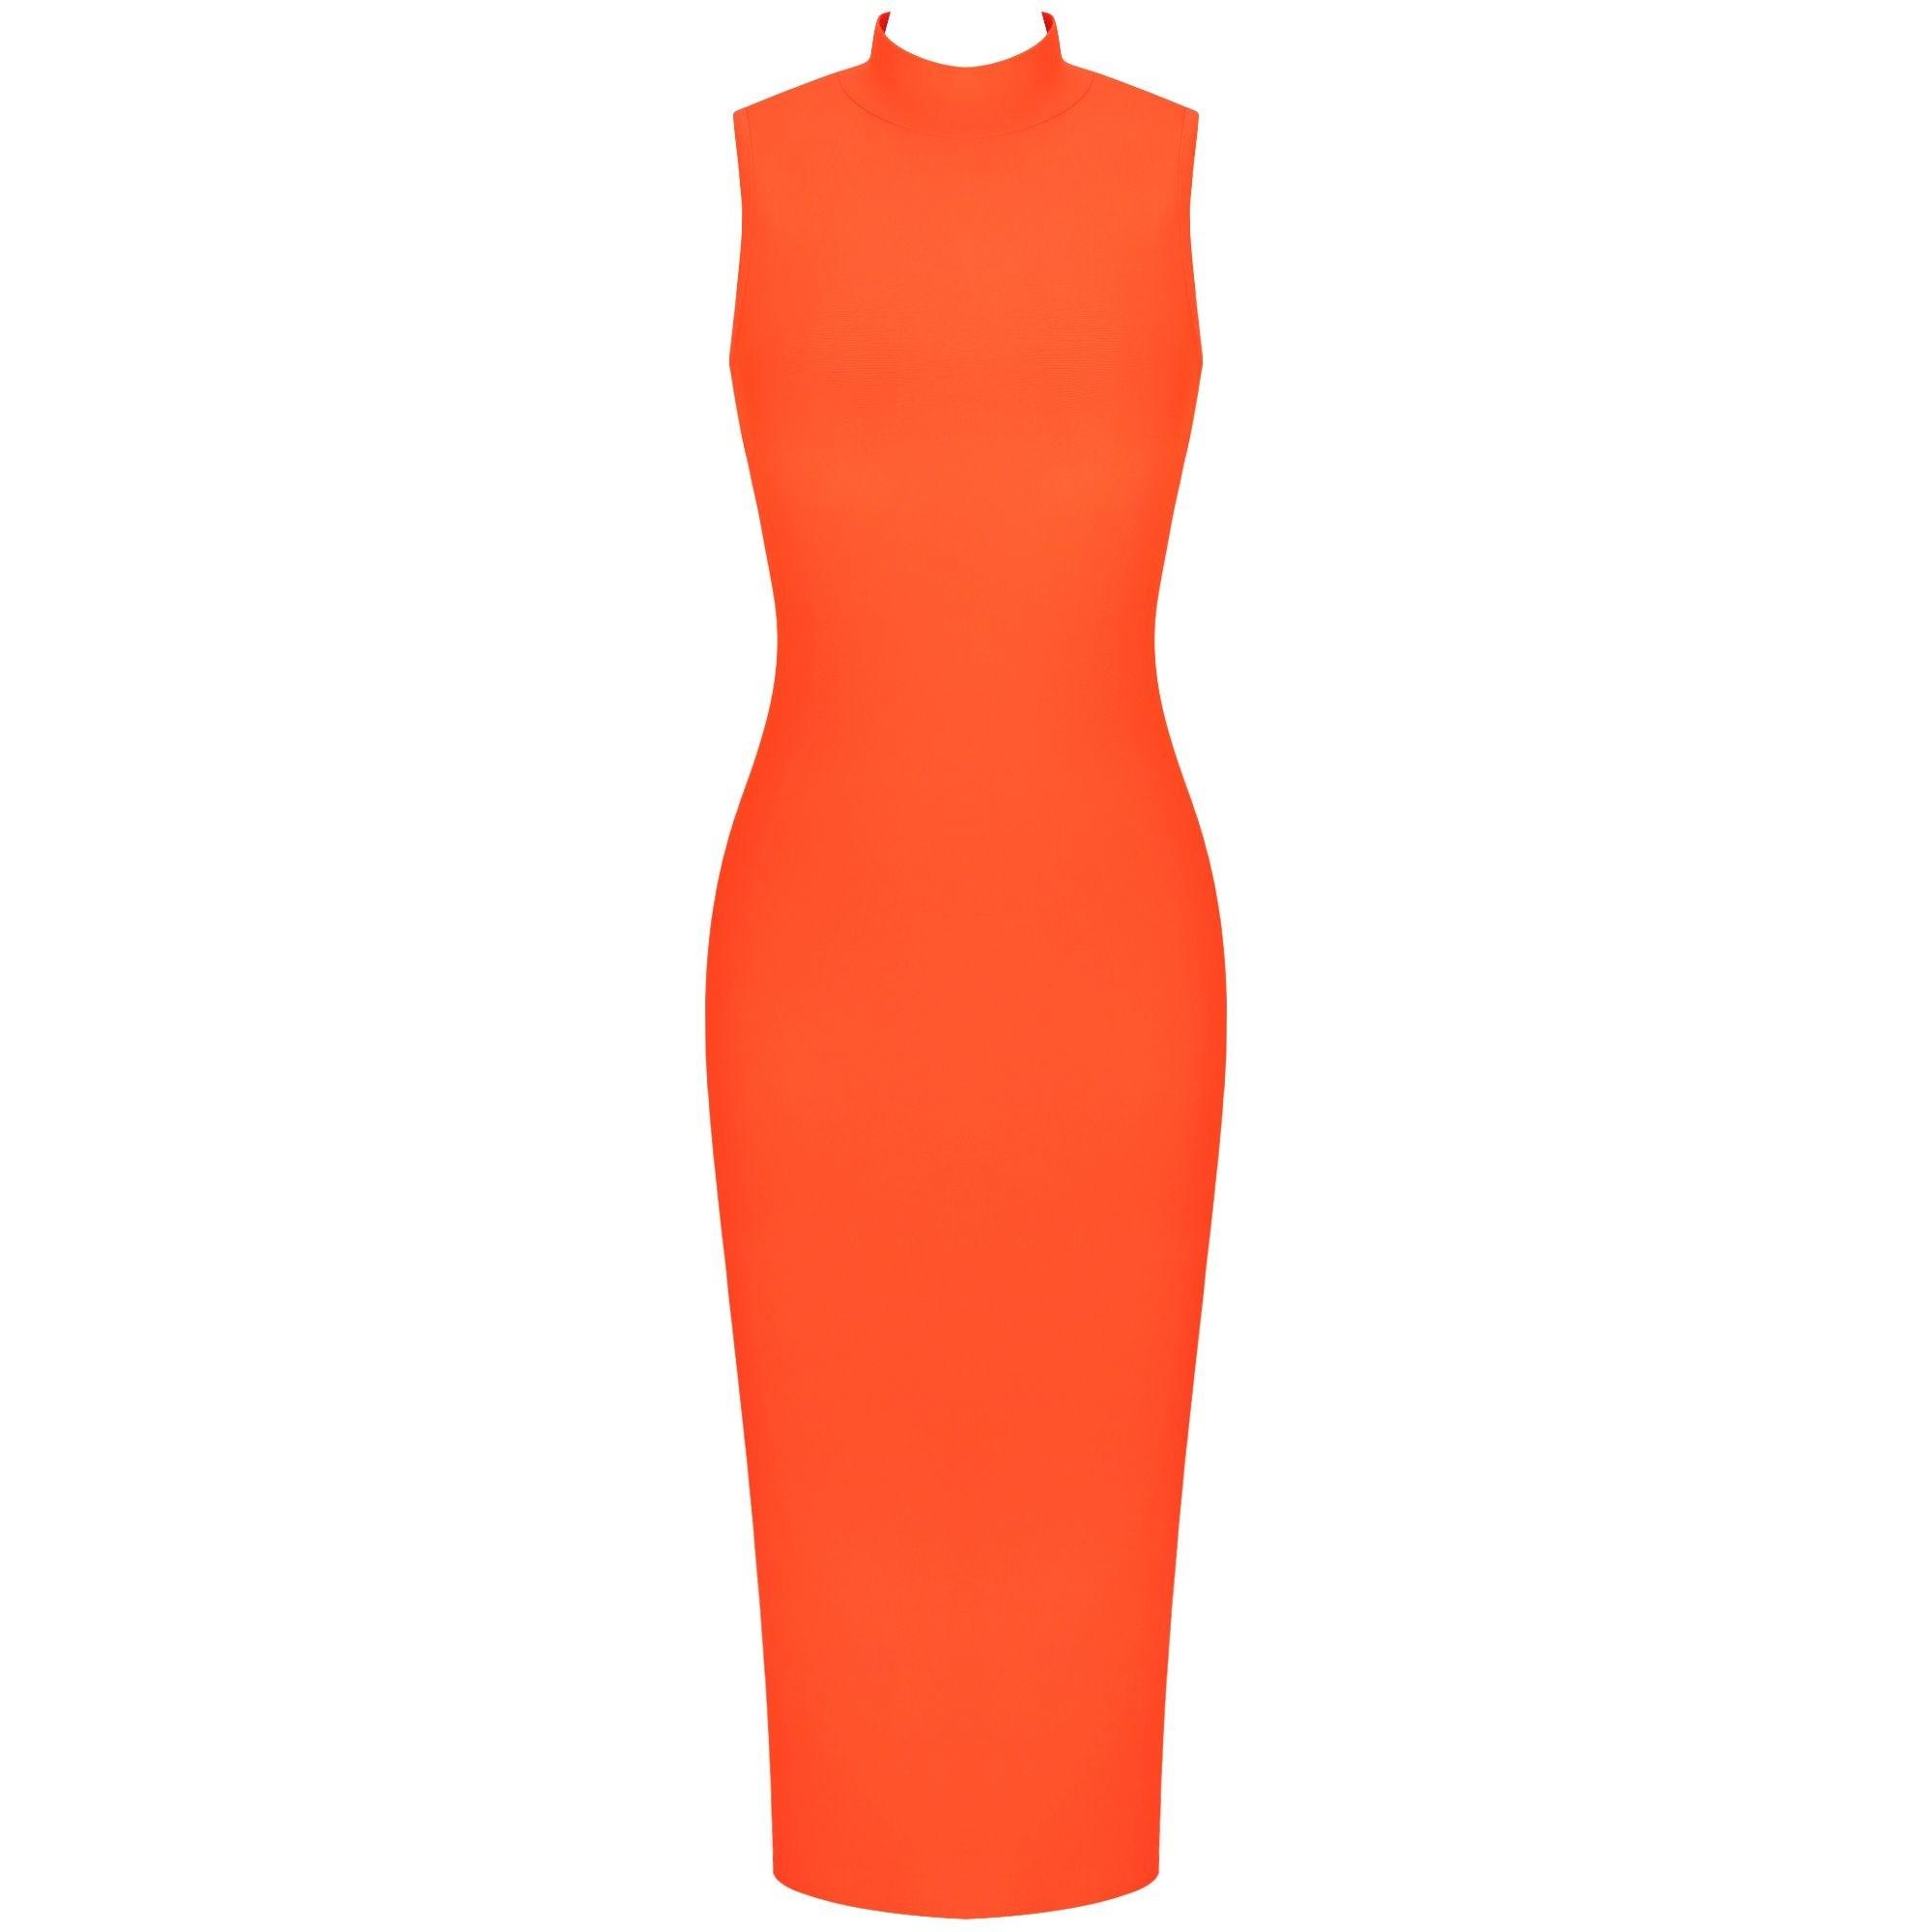 Neon Orange Over Knee Sleeveless High Neck Bandage Dress PF19072-Neon-Orange